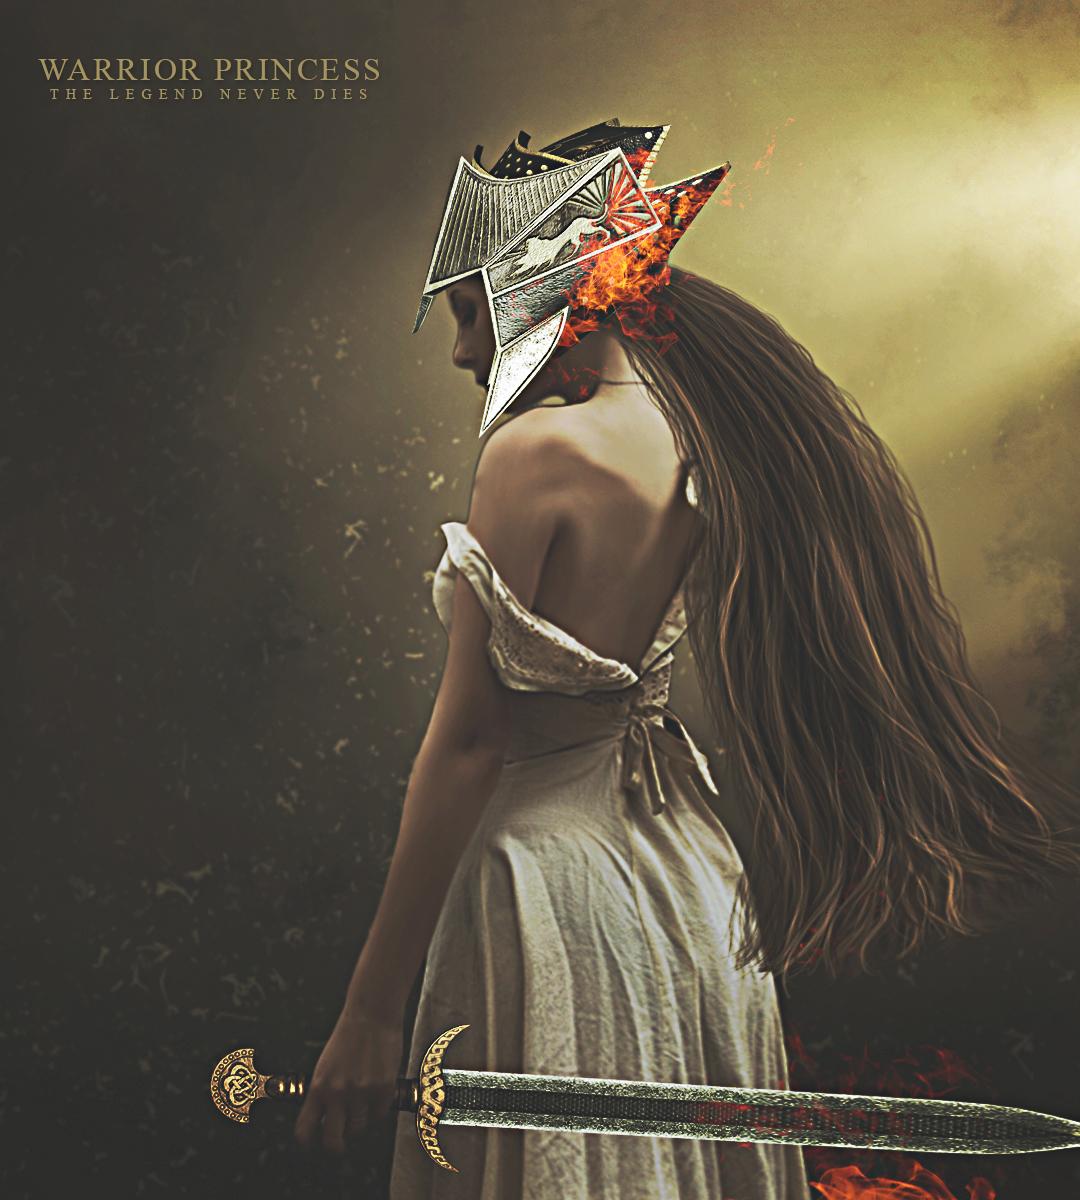 Create Warrior Princes Digital Art In Photoshop